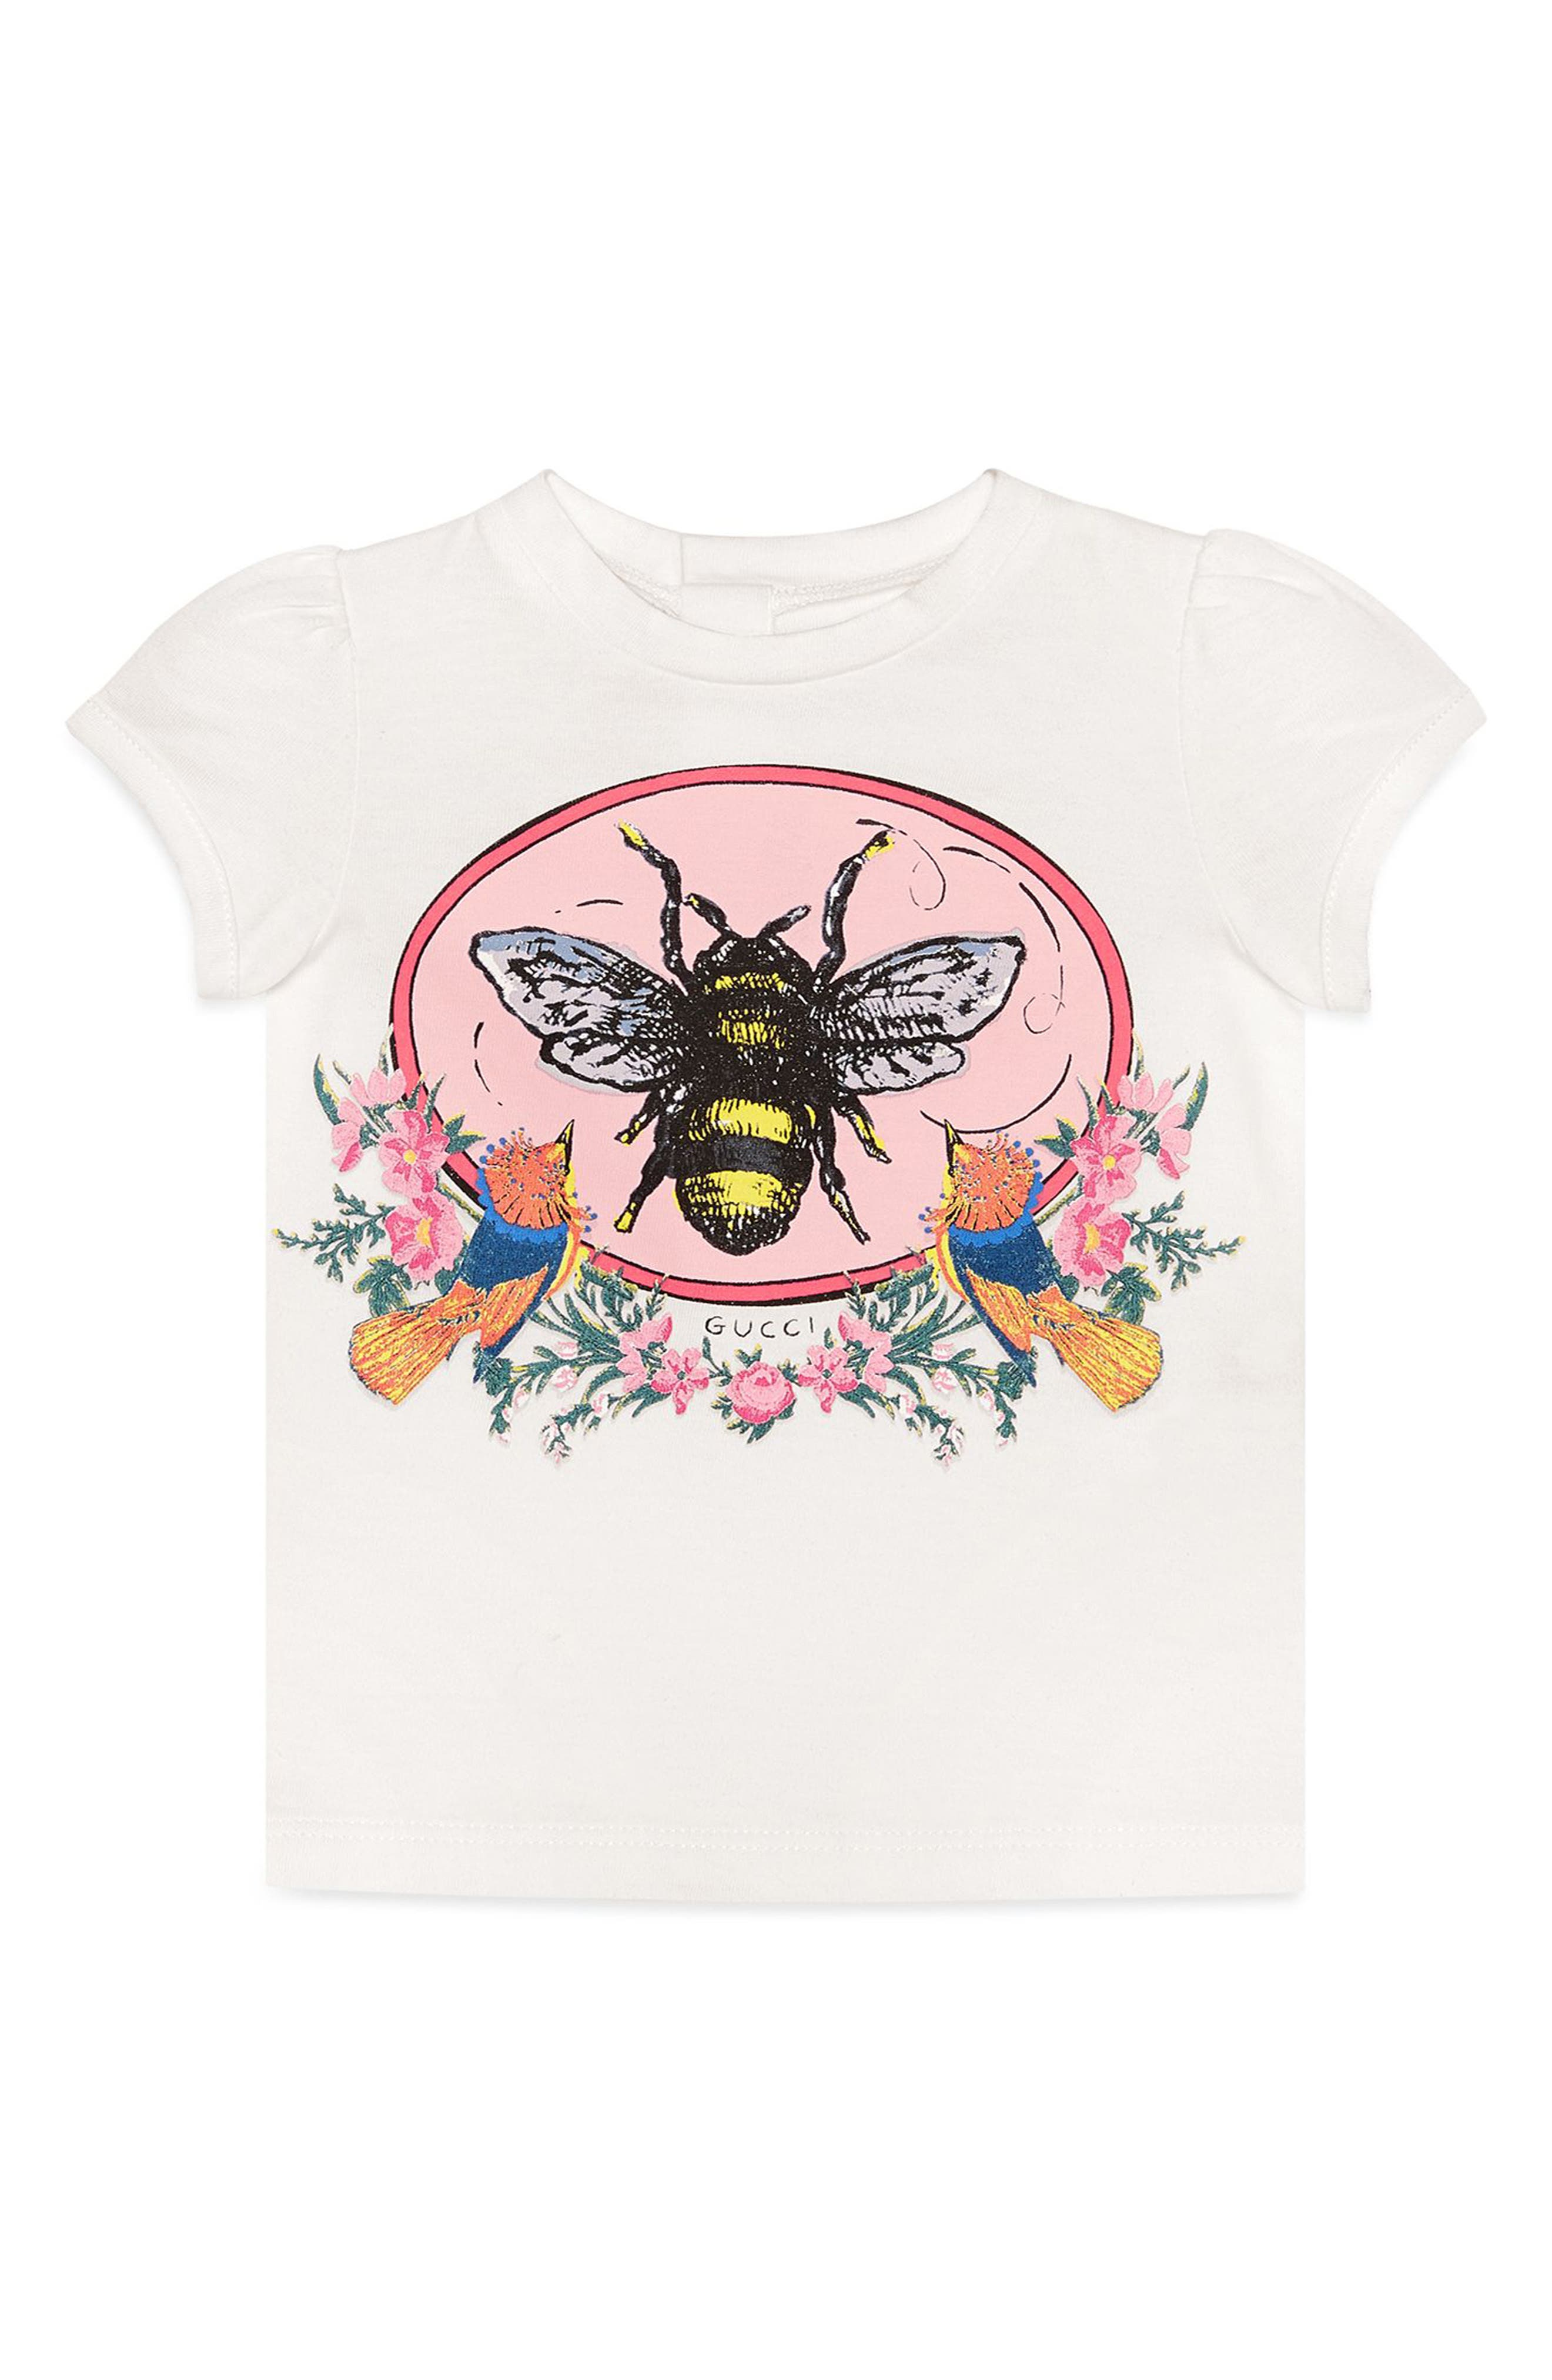 Gucci Bee Graphic Tee (Baby Girls)